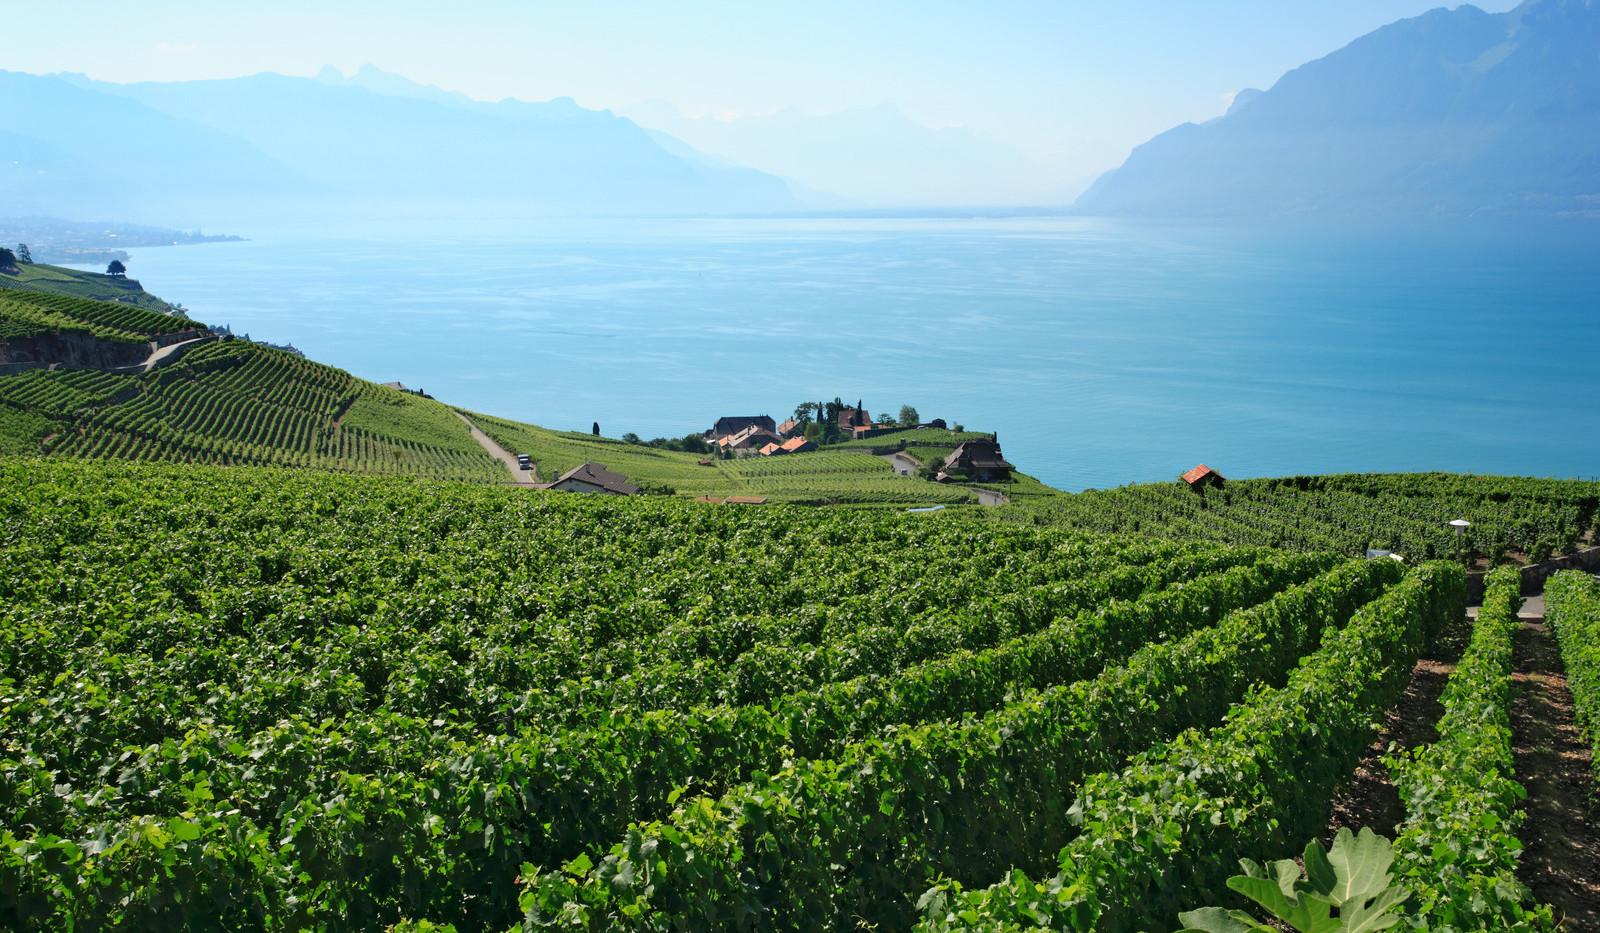 Canva - Vineyards in Switzerland.jpg